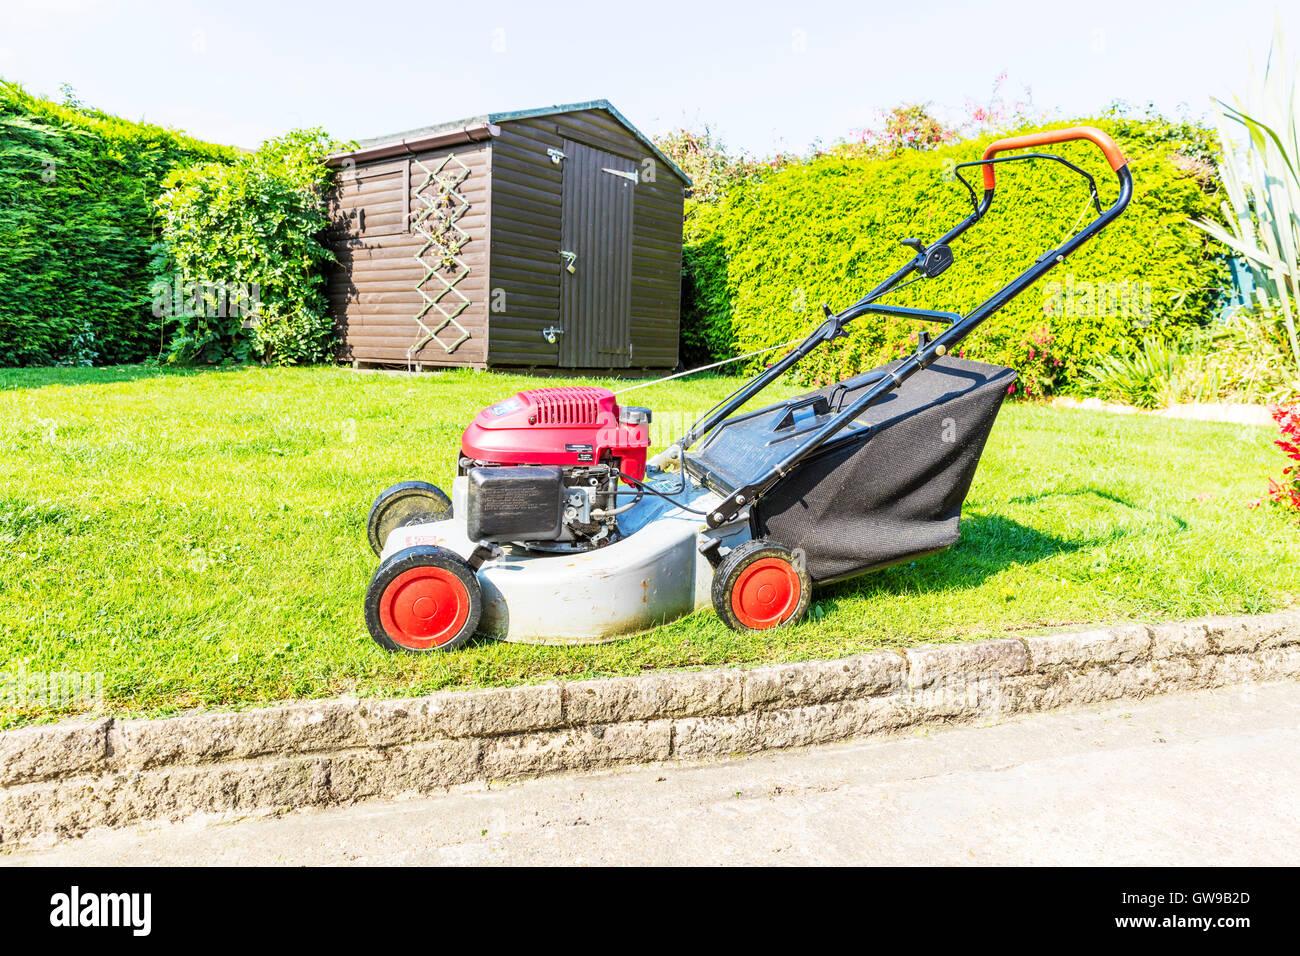 grass cutting machine stockfotos grass cutting machine bilder alamy. Black Bedroom Furniture Sets. Home Design Ideas